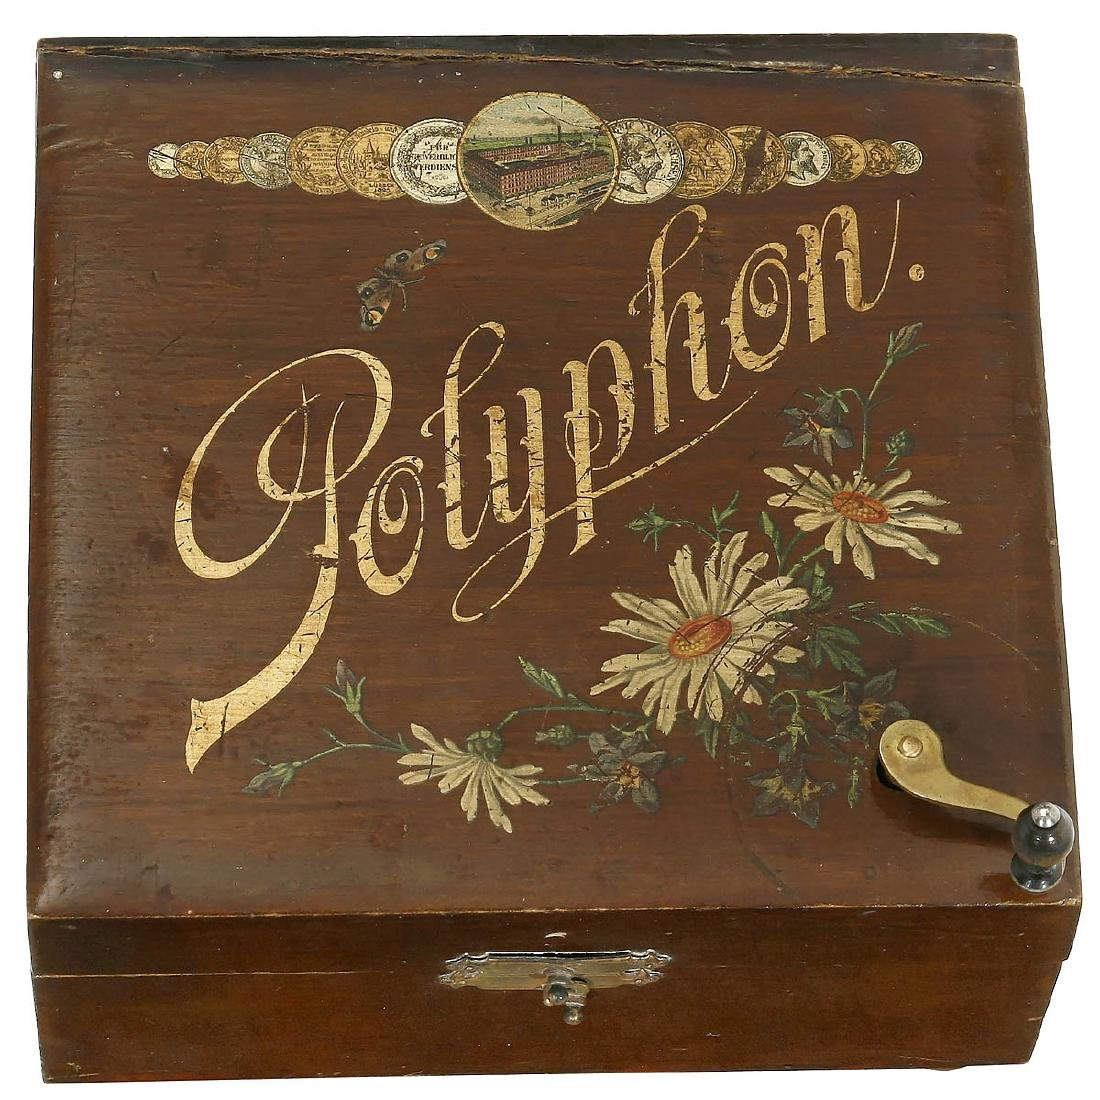 Polyphon Manivelle Disc Musical Box, c. 1900